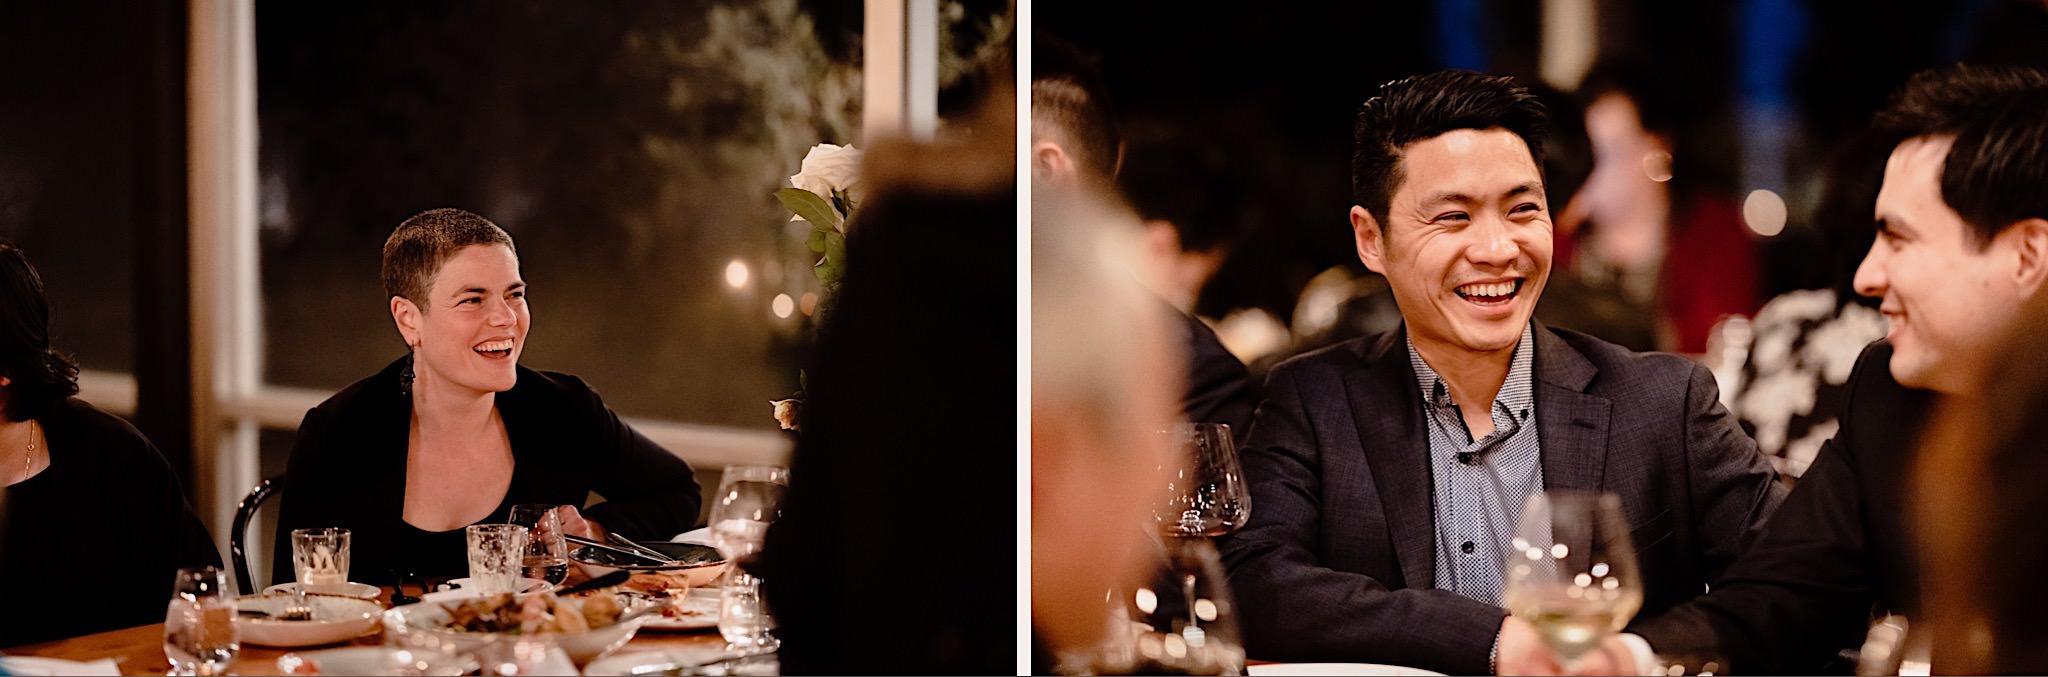 Zonzo Estate Winery Yarra Valley Wedding52.jpg